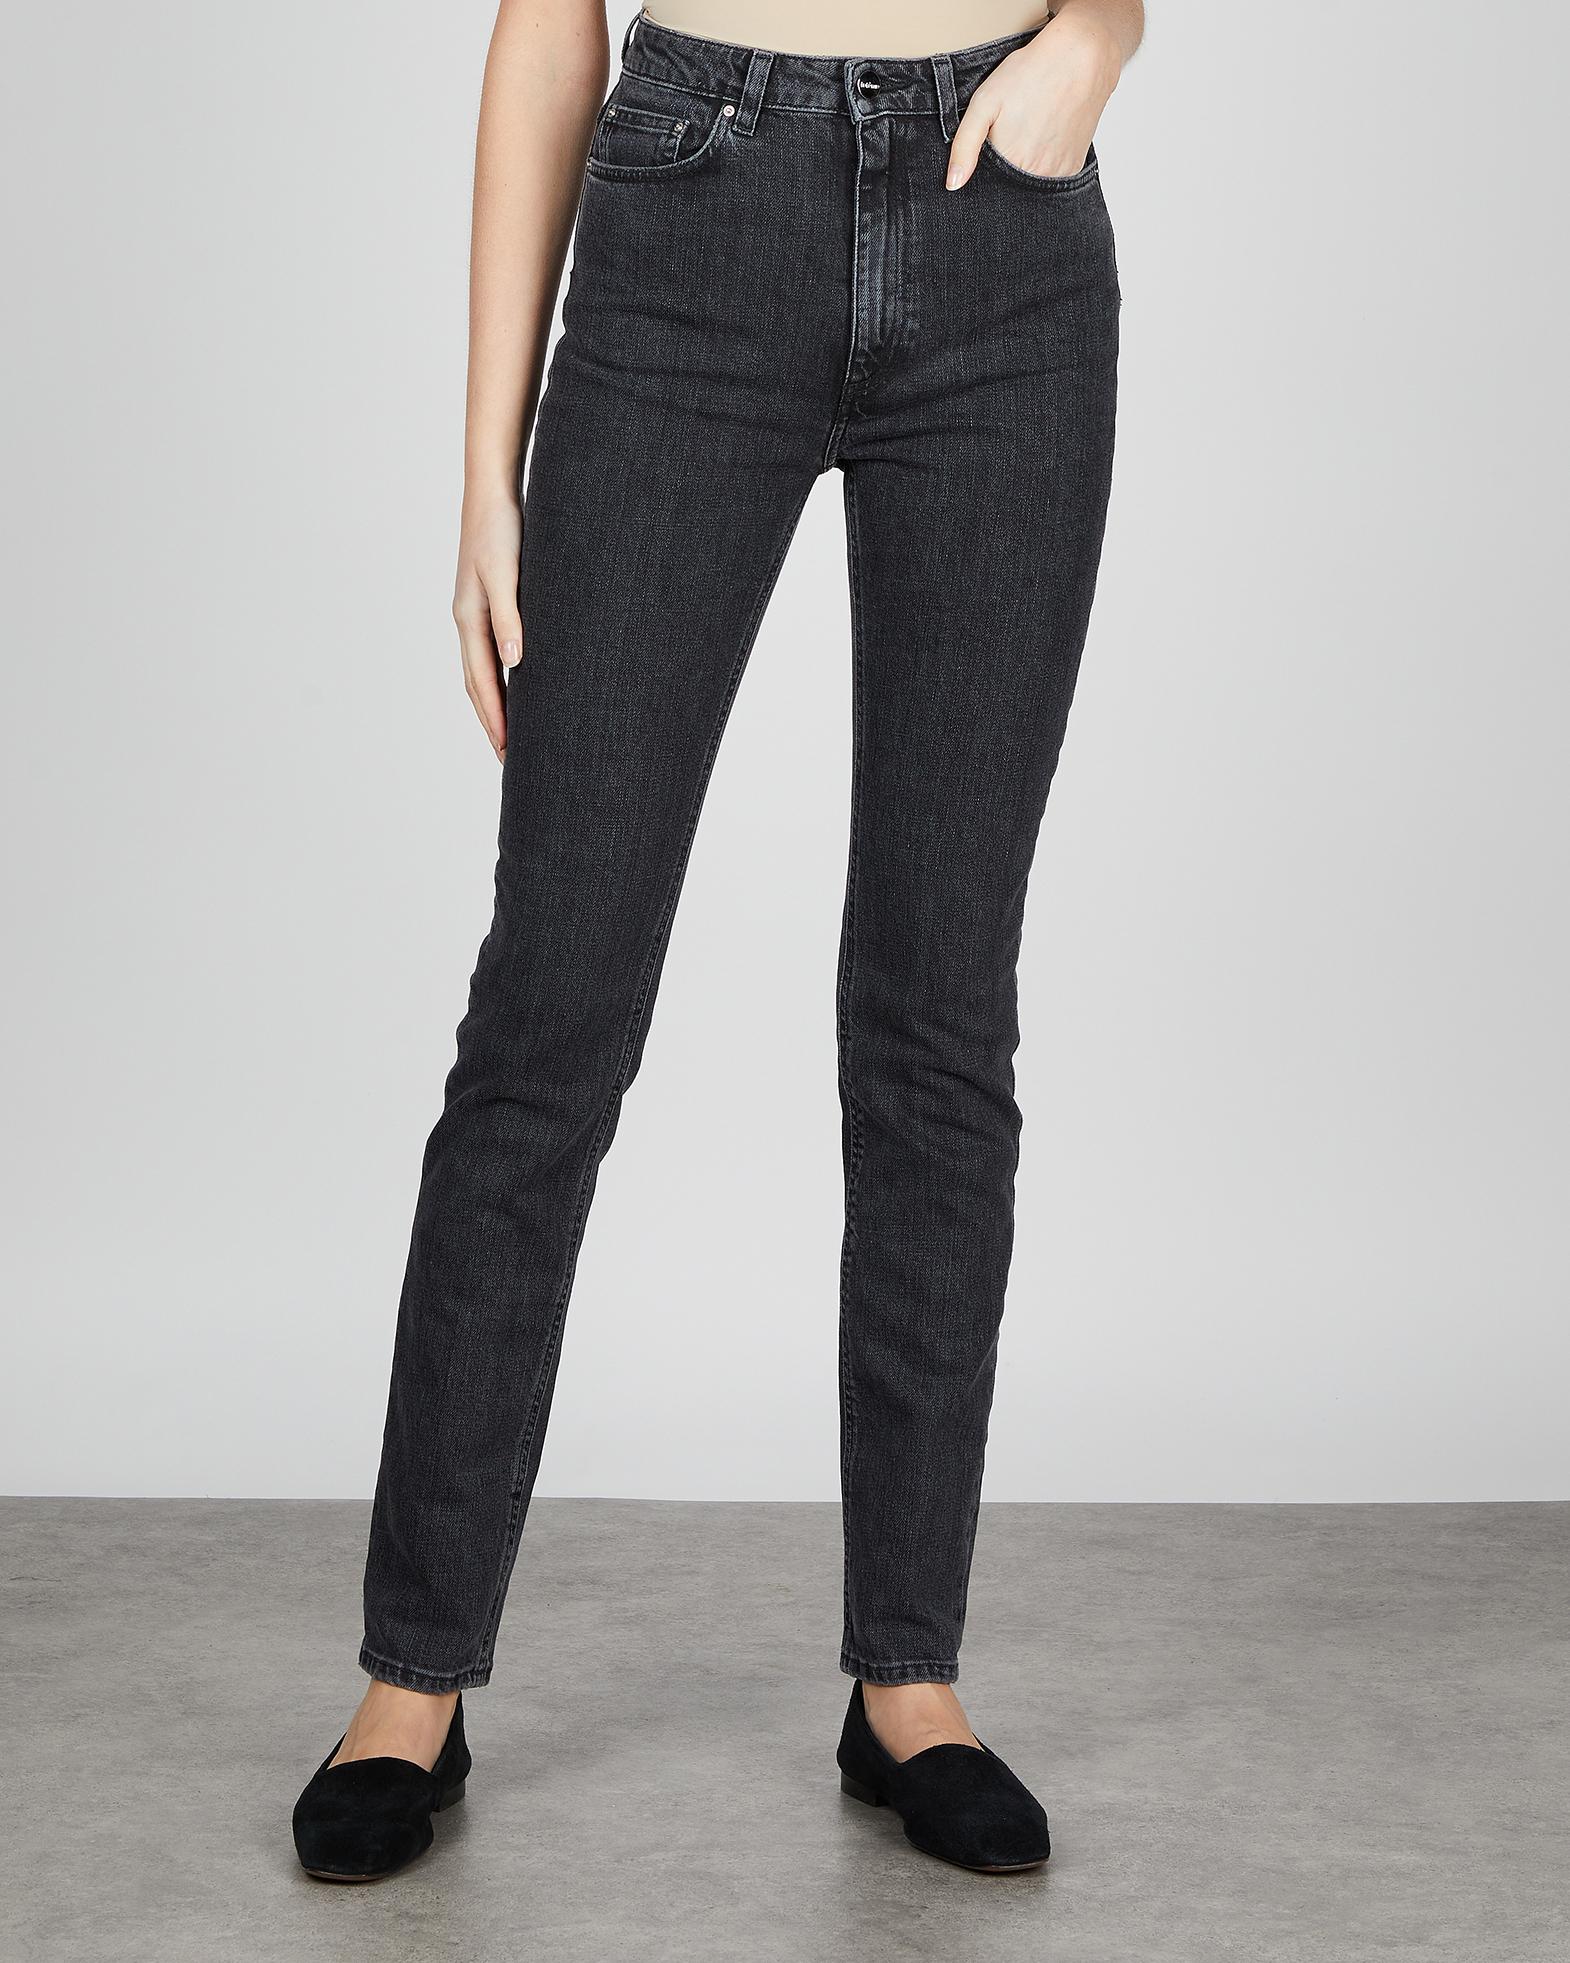 Totême Jeans Skinny Fit grey 23/32